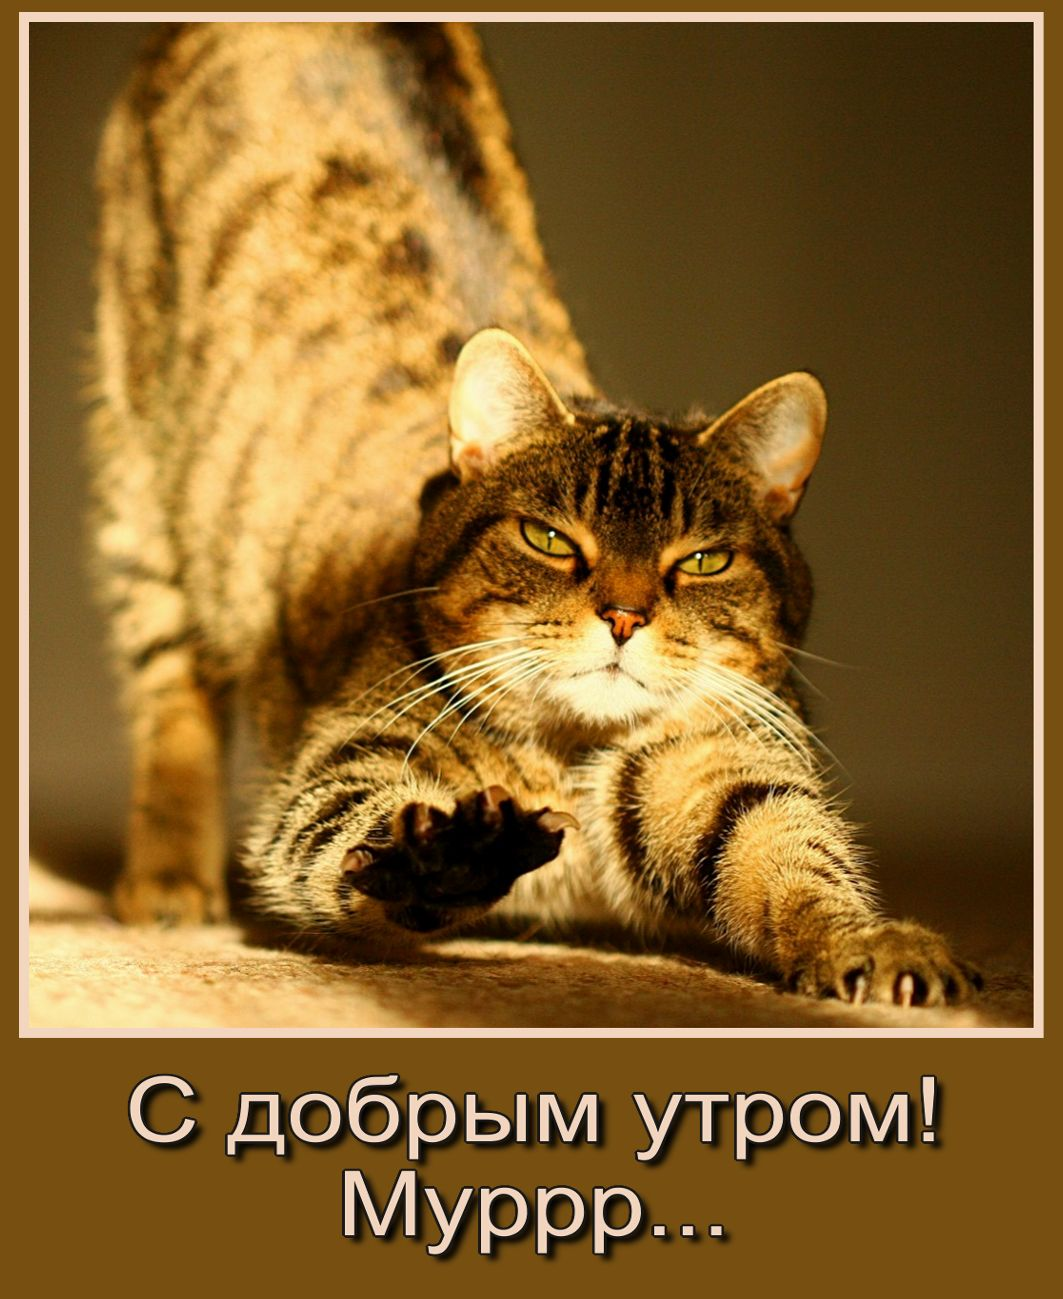 Фото котенка с добрым утром